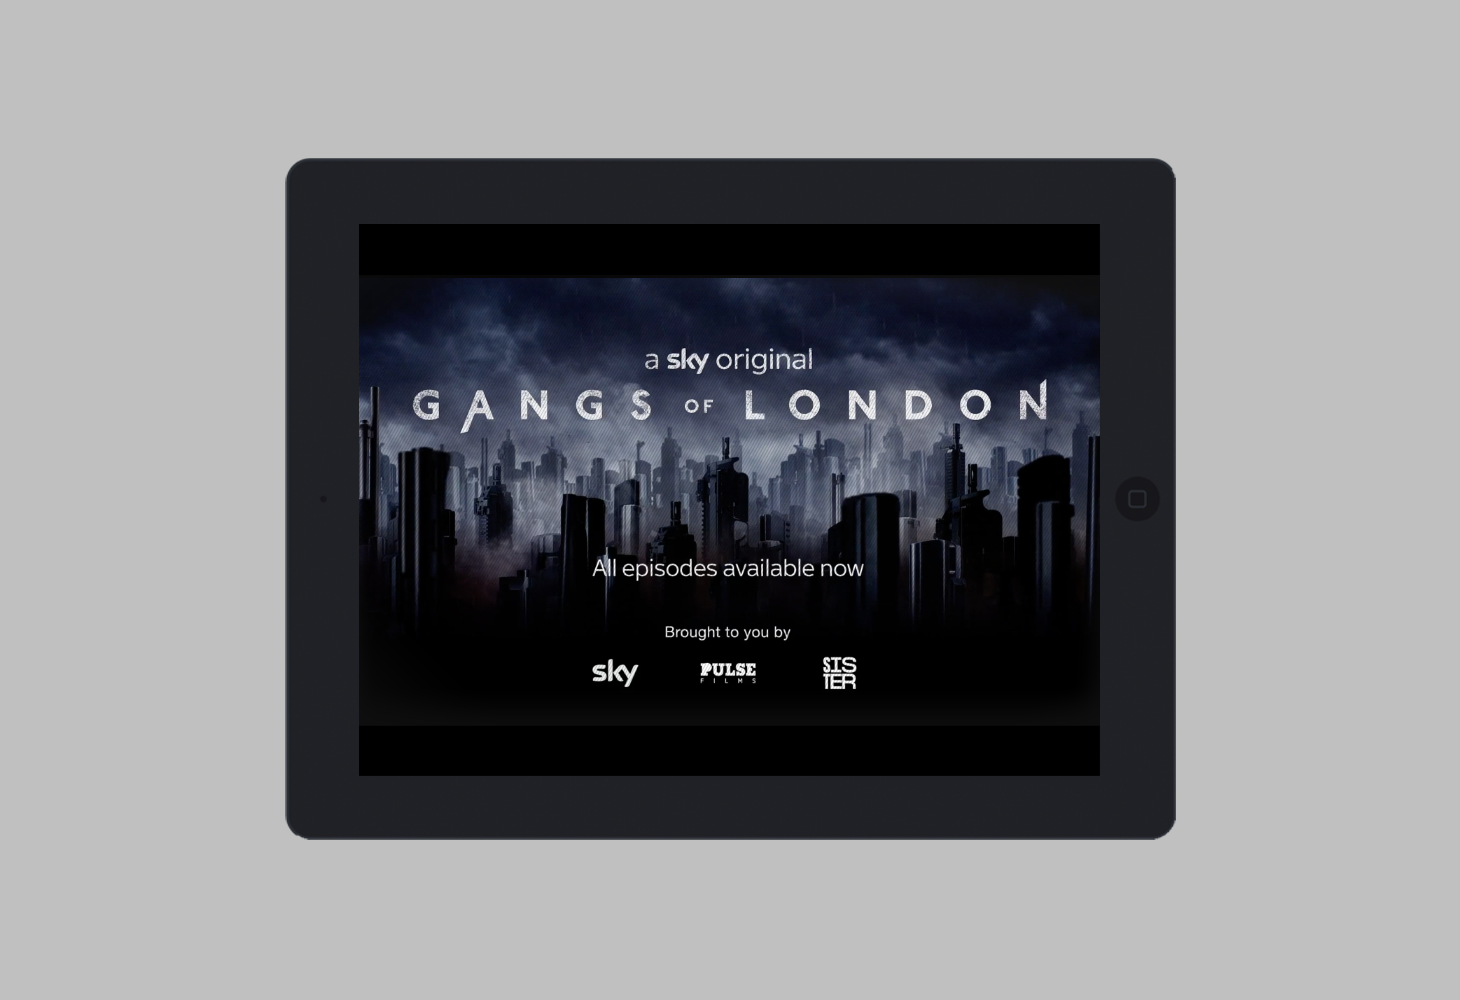 Real Gangs Of London Work Warwicka Design Art Direction 44 0 1332 224446 The Website Of Art Director And Designer Andrew Warwick Derby Derbyshire